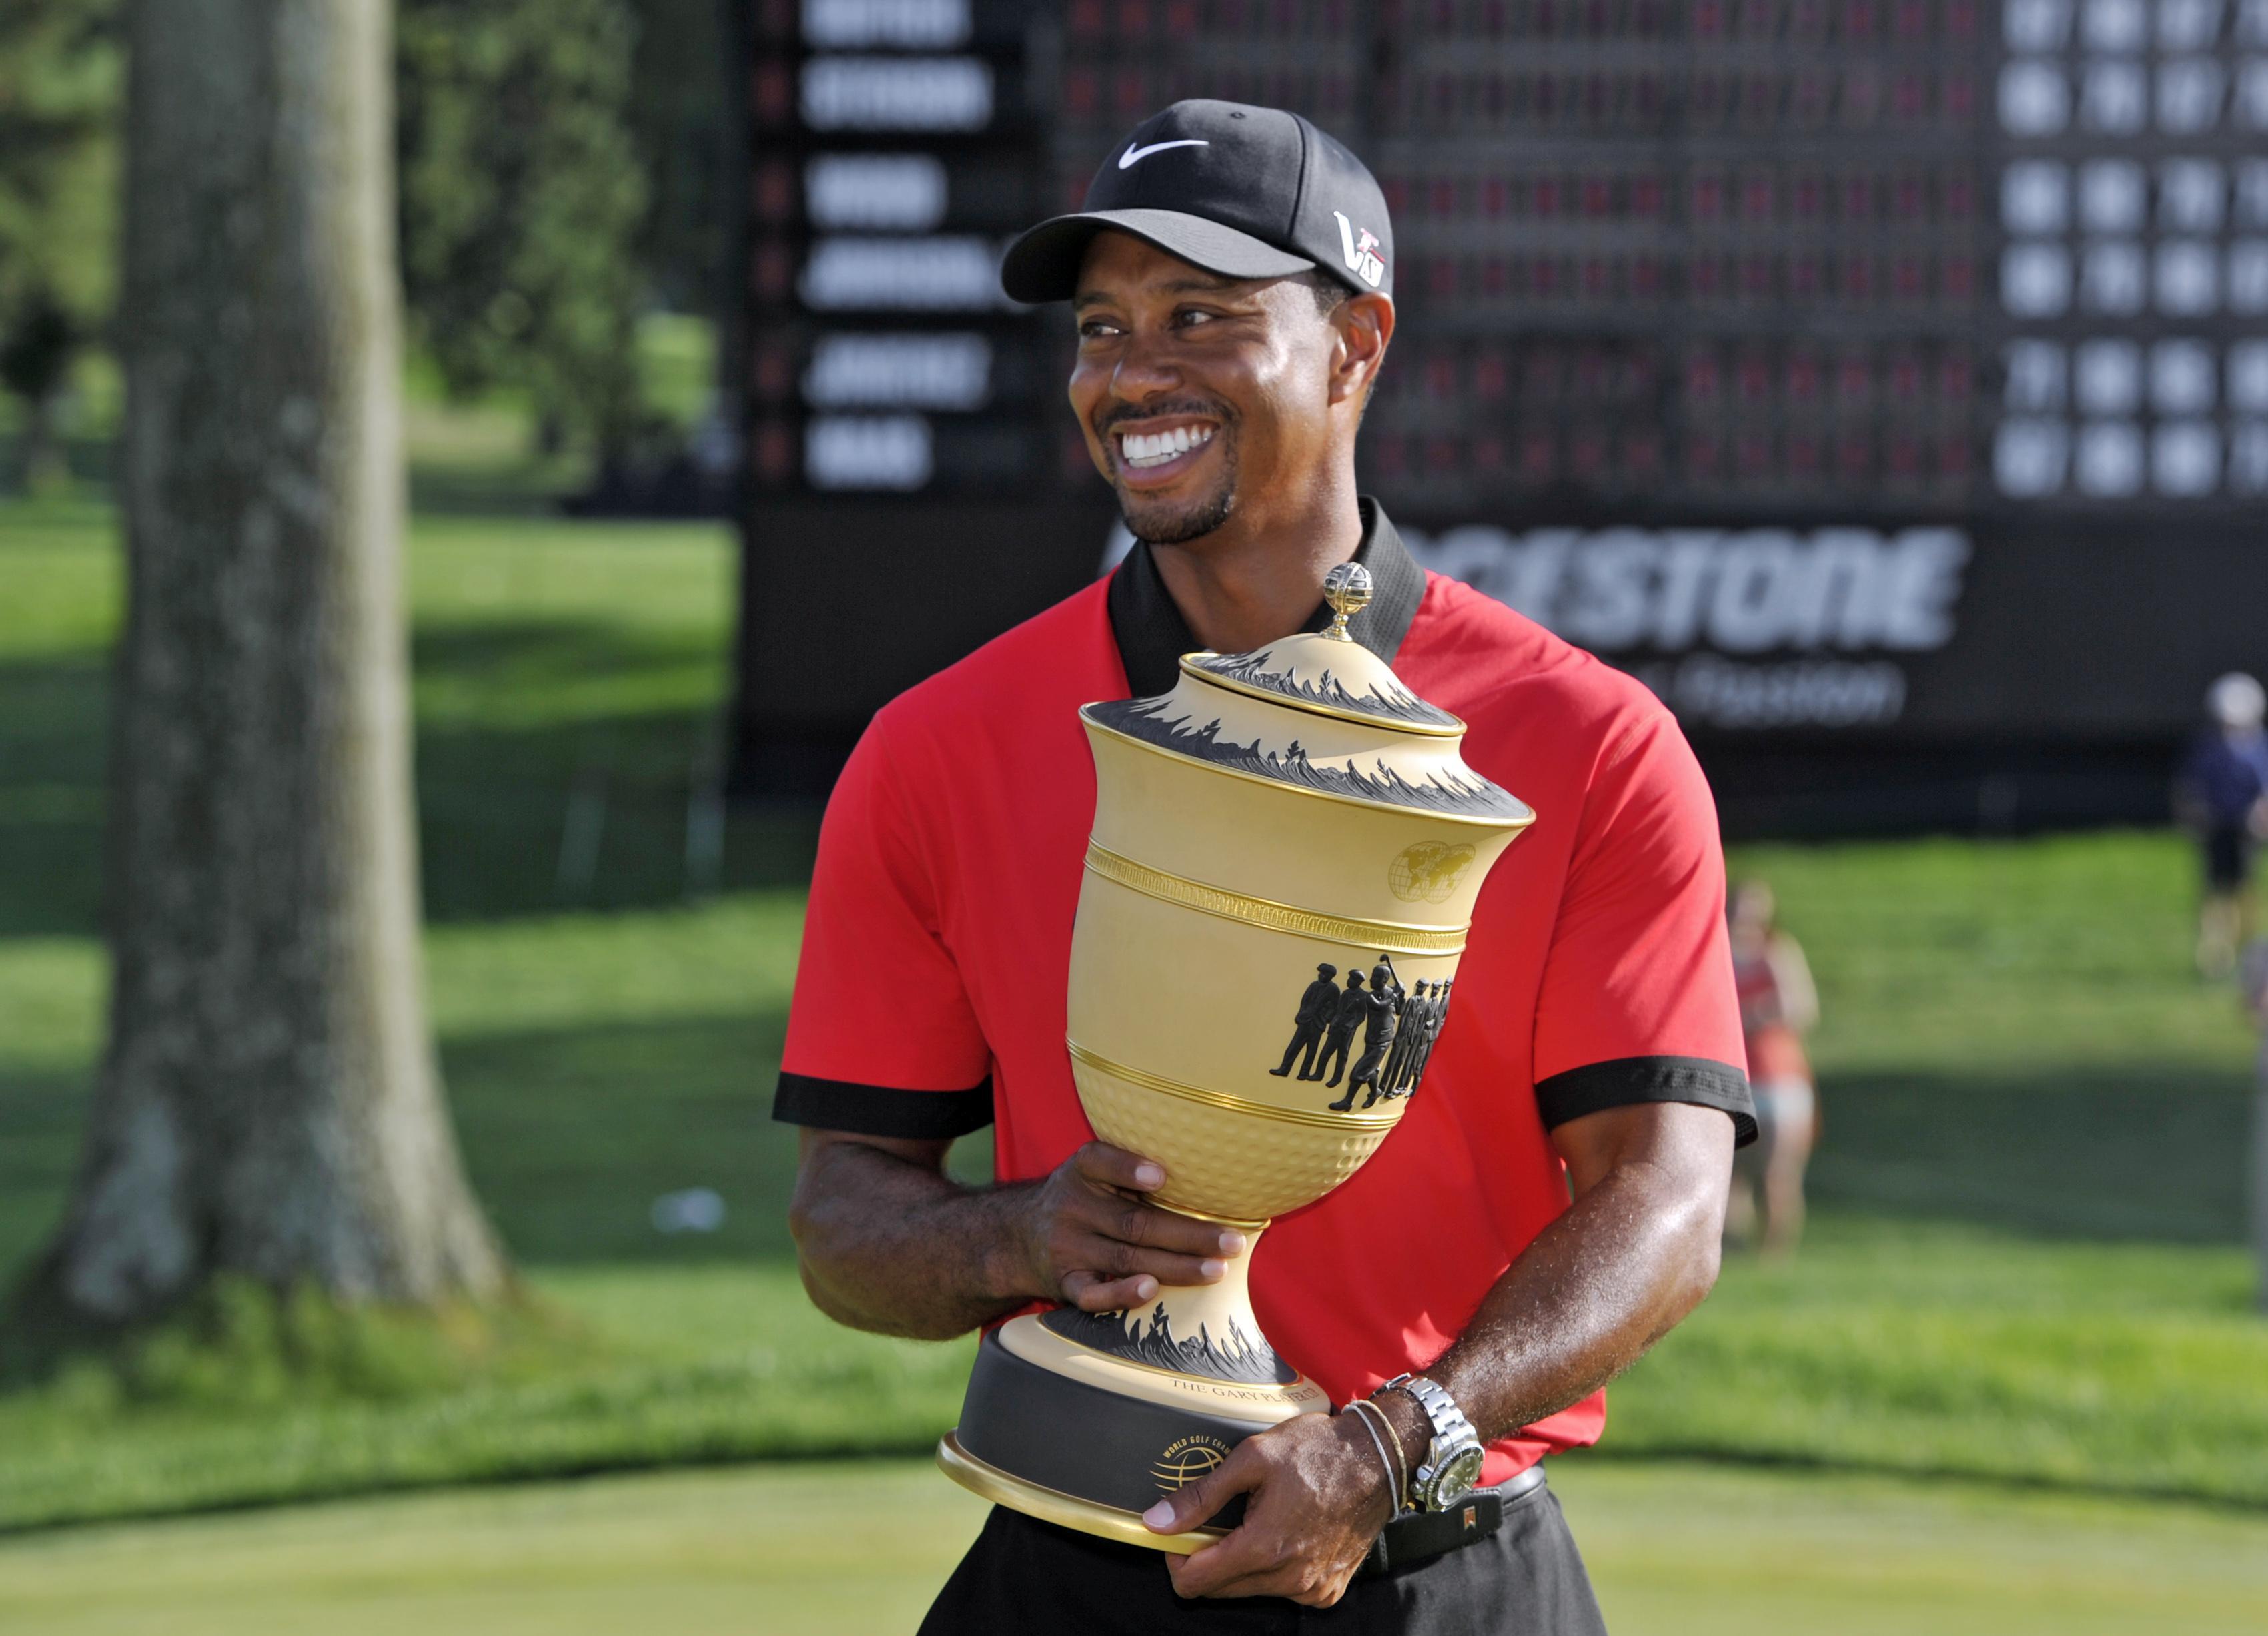 Woods won his last tournament at the Bridgestone Invitational in August 2013